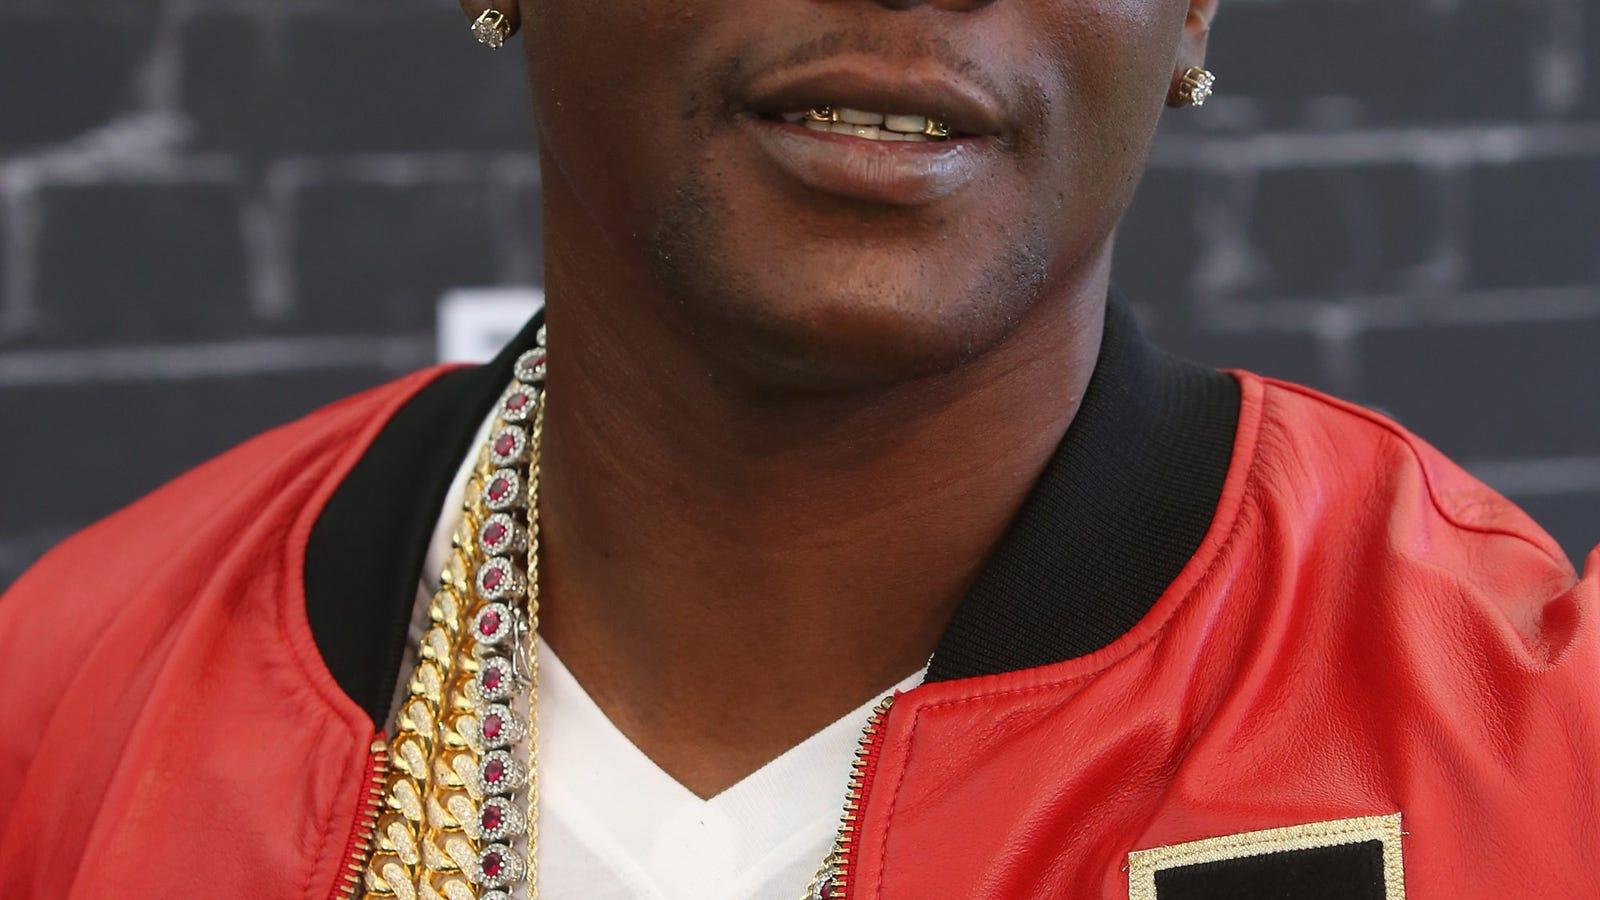 Rapper Lil Boosie On Baton Rouge, La., Shooting: 'Attacks